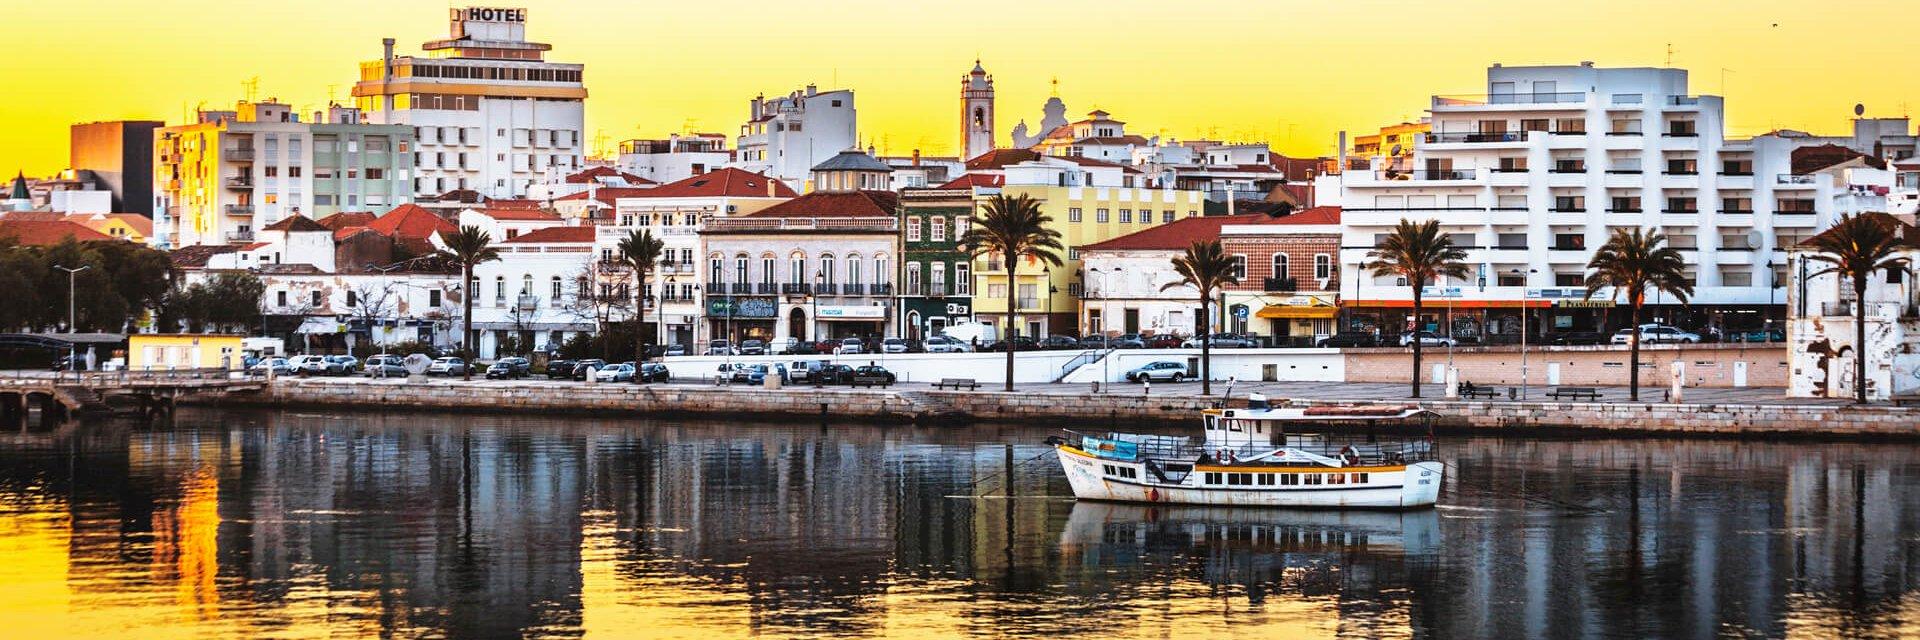 Séjour en Algarve